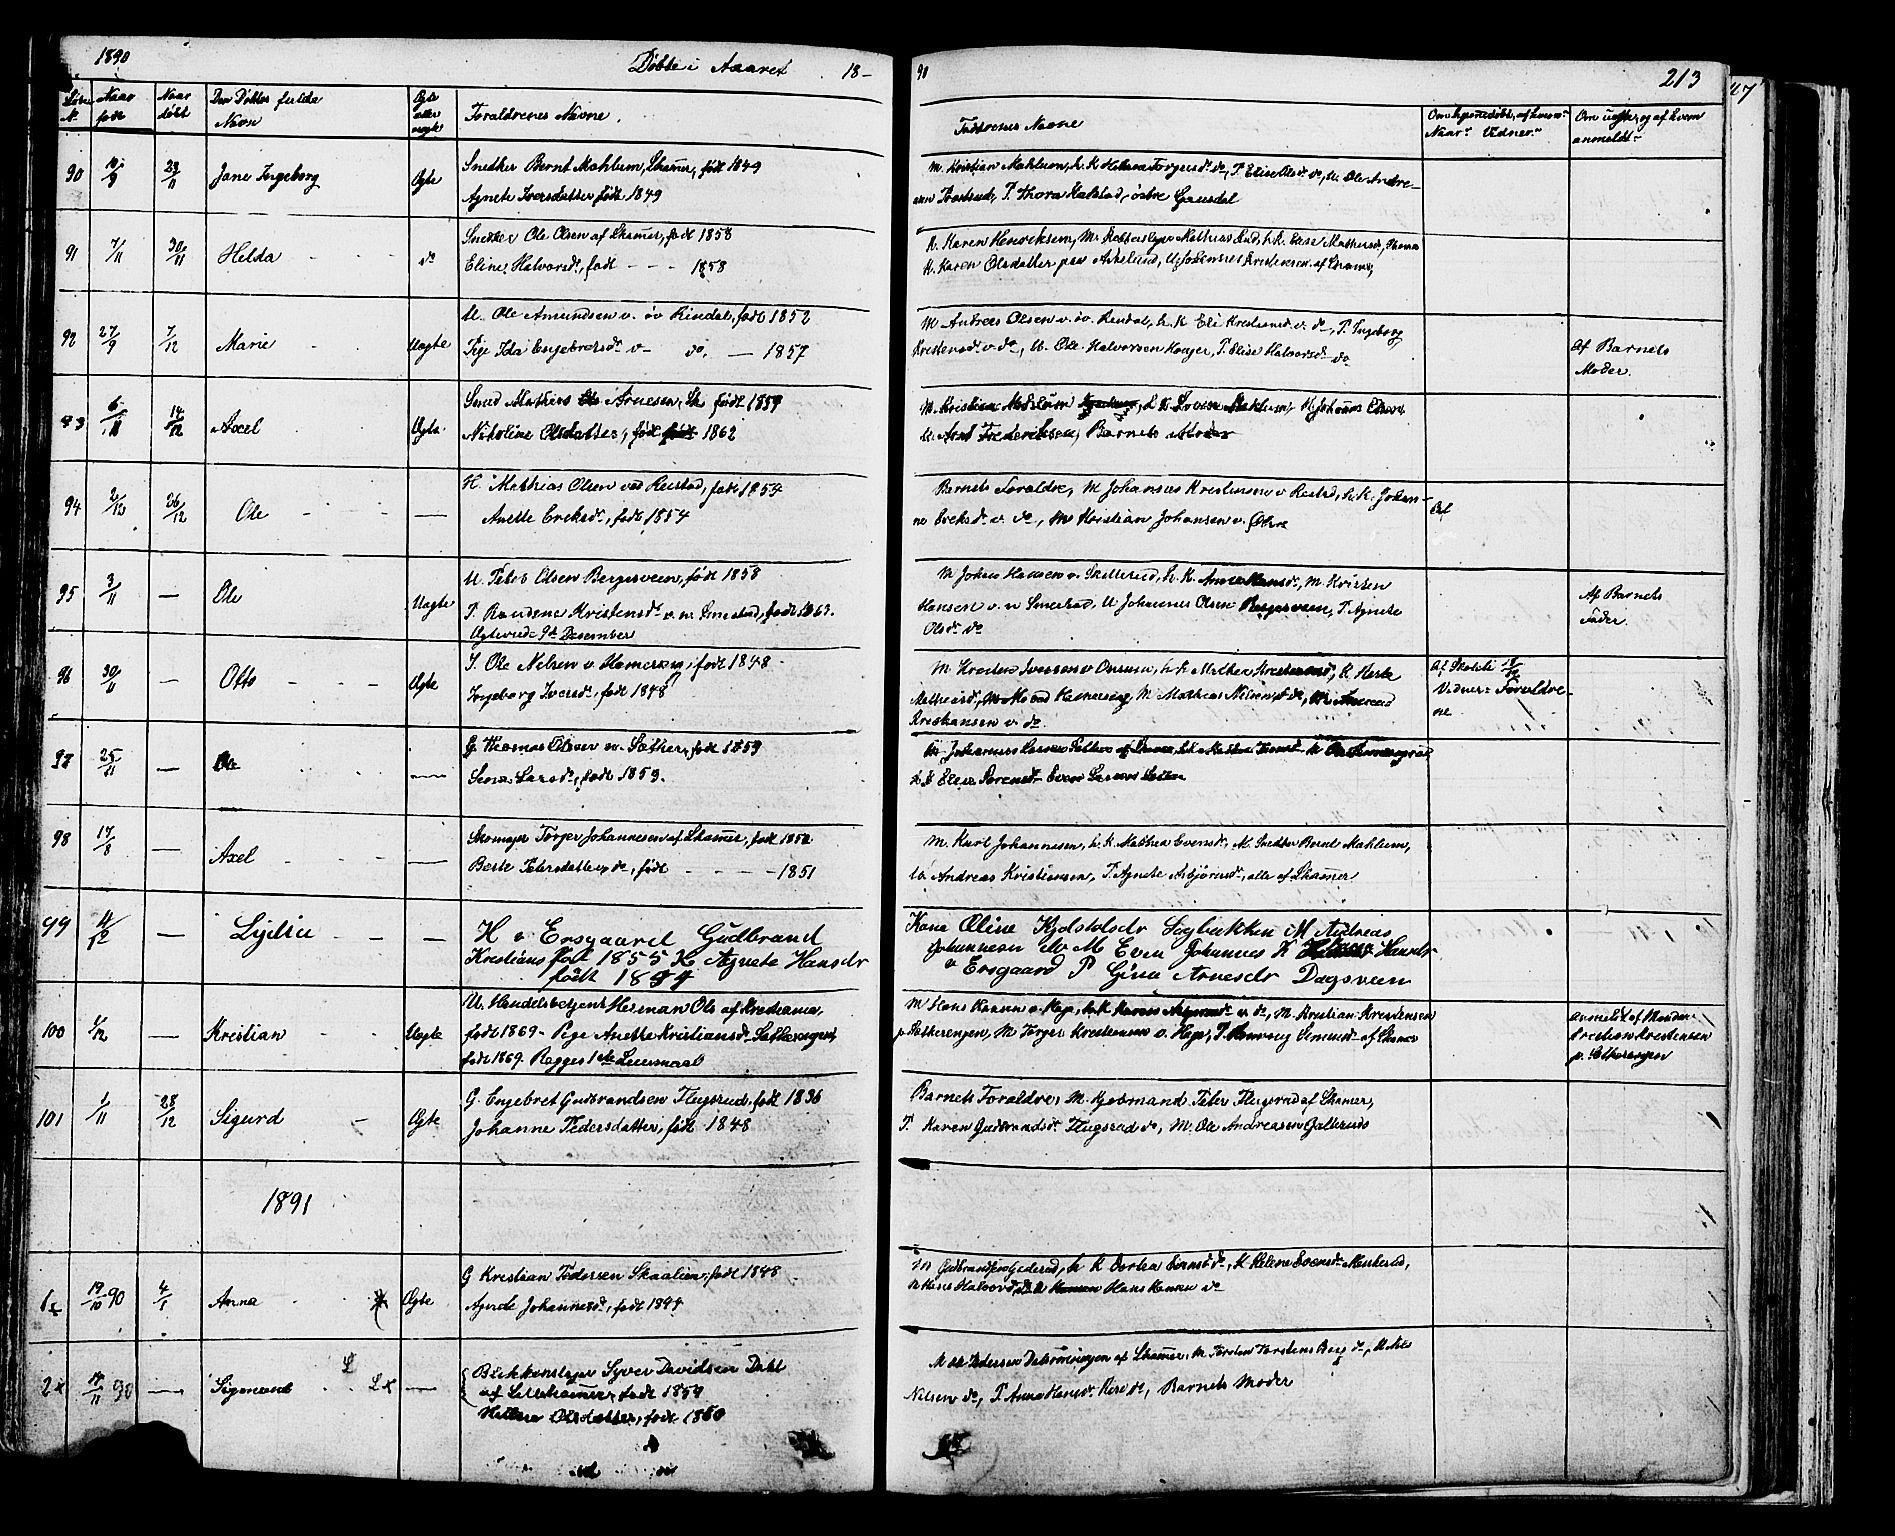 SAH, Fåberg prestekontor, Klokkerbok nr. 7, 1856-1891, s. 212-213